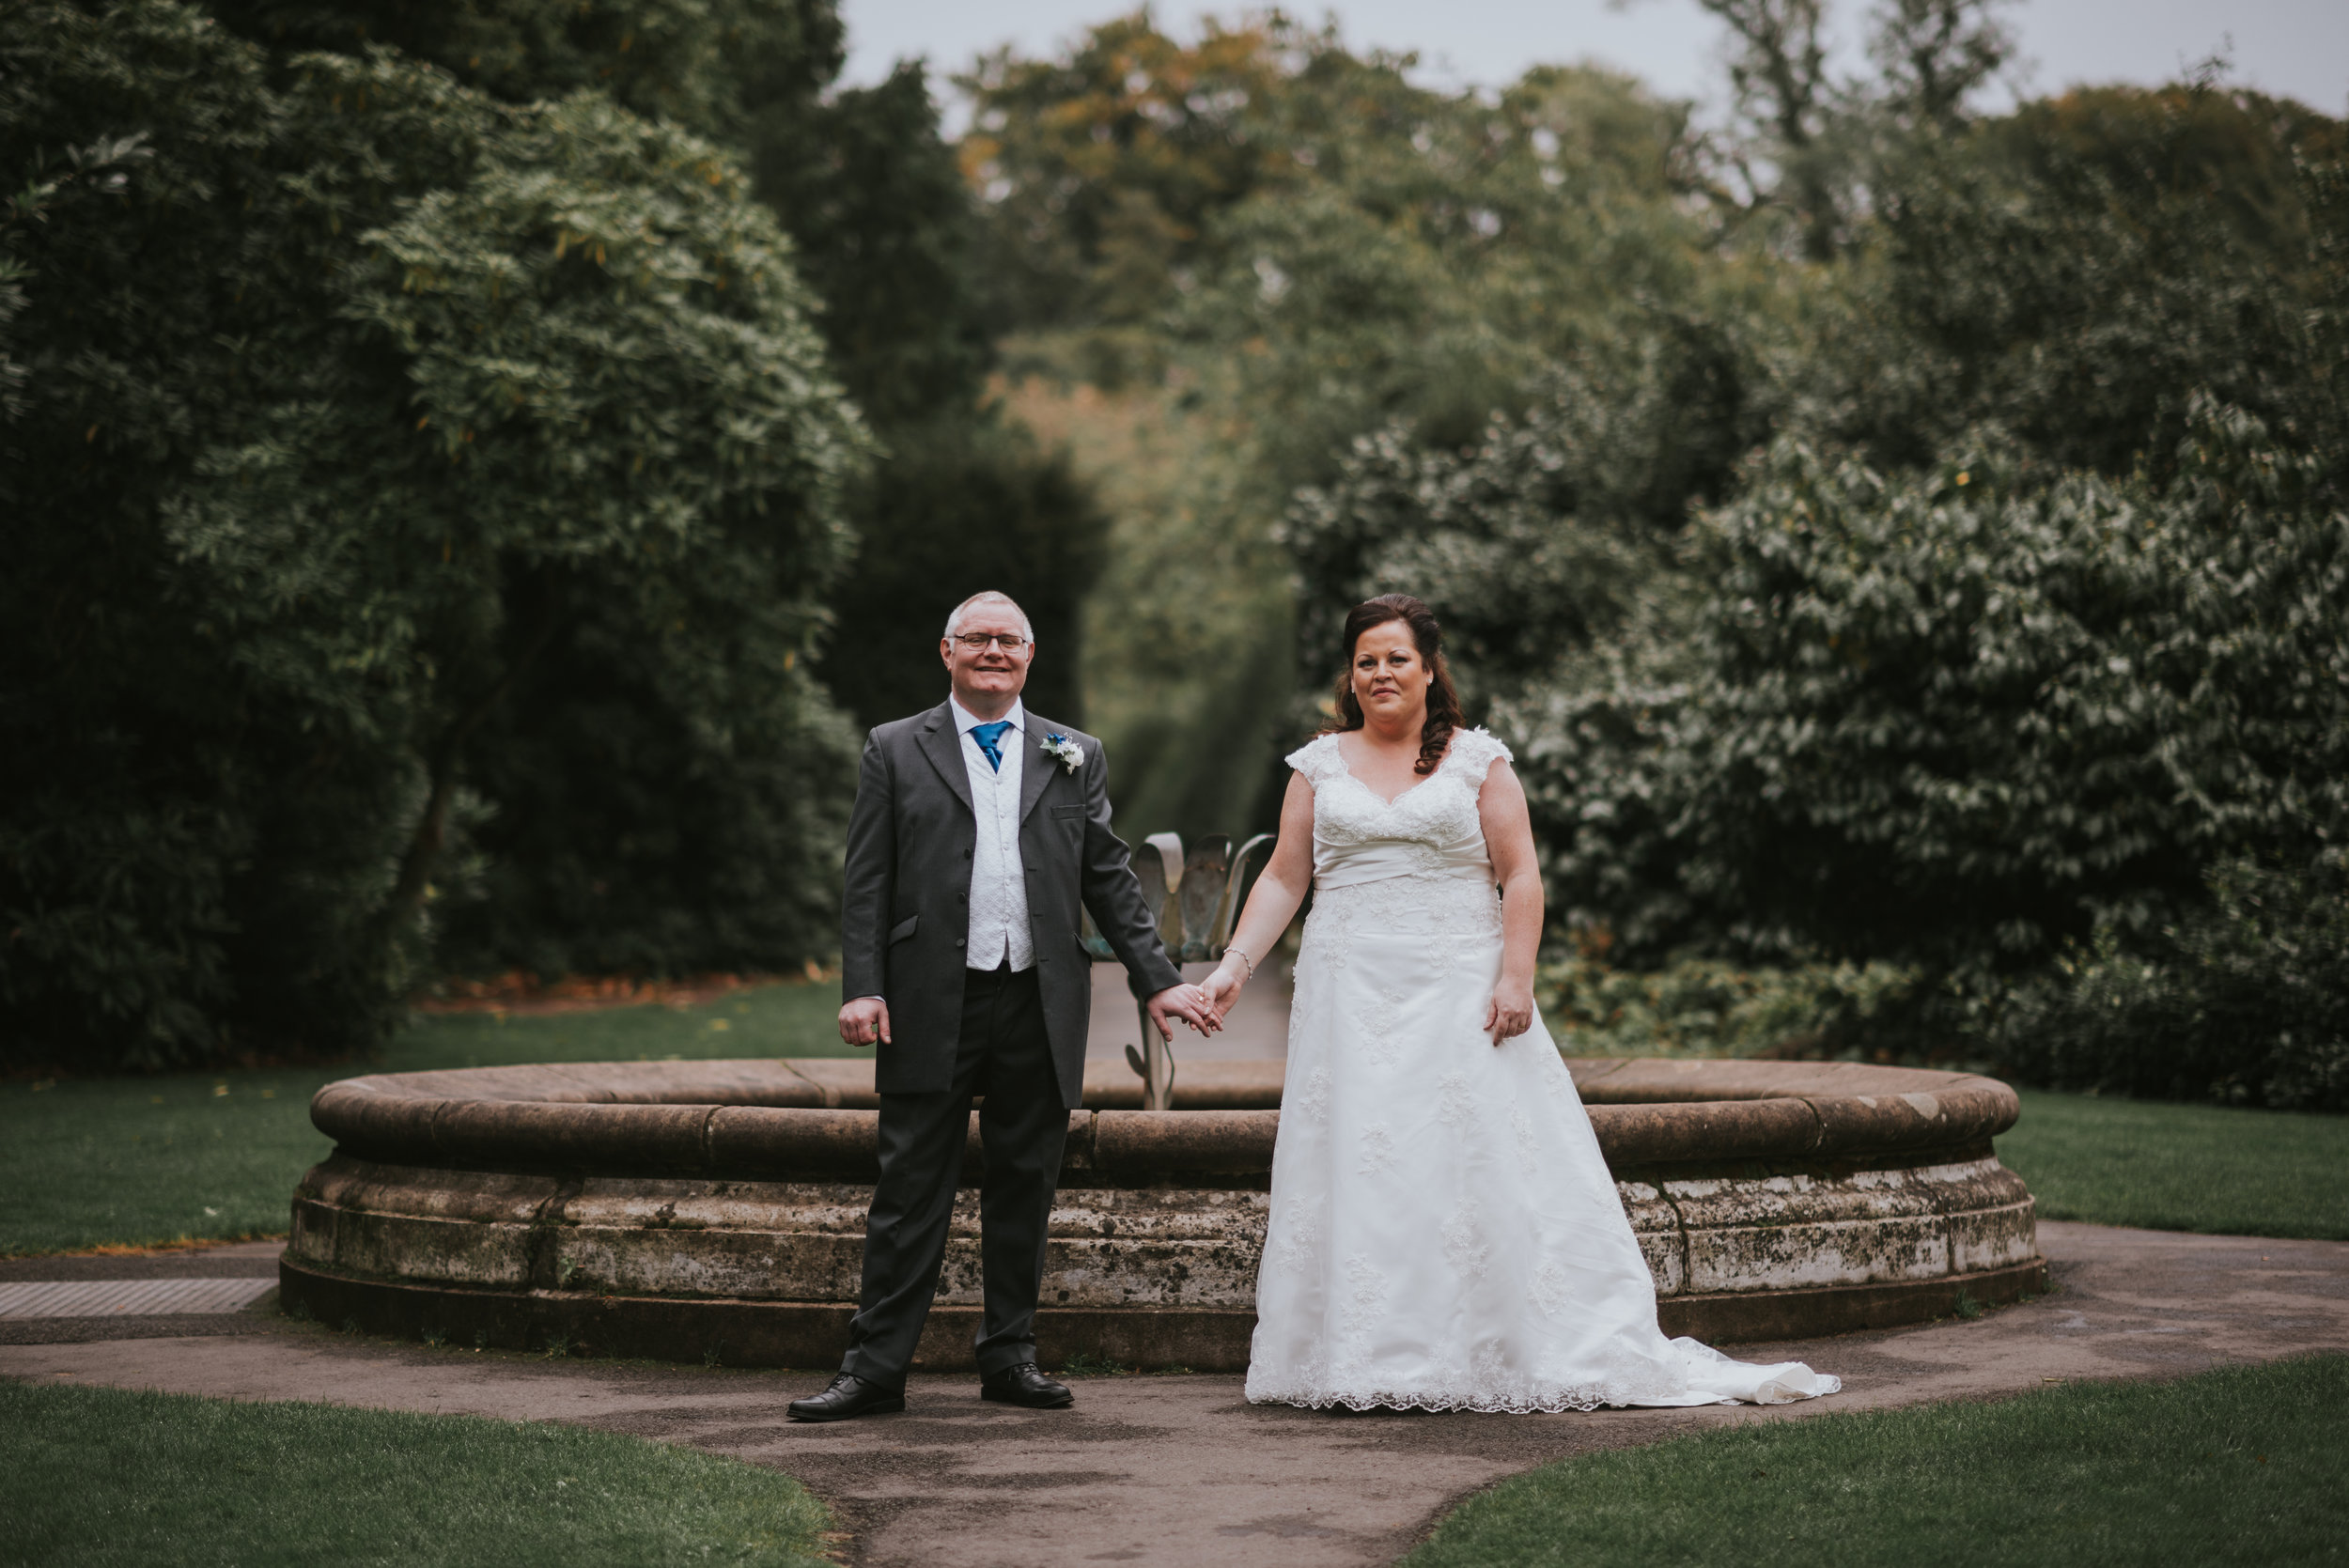 Lady dixon park belfast wedding photographer pure photo n.i bride and groom portraits